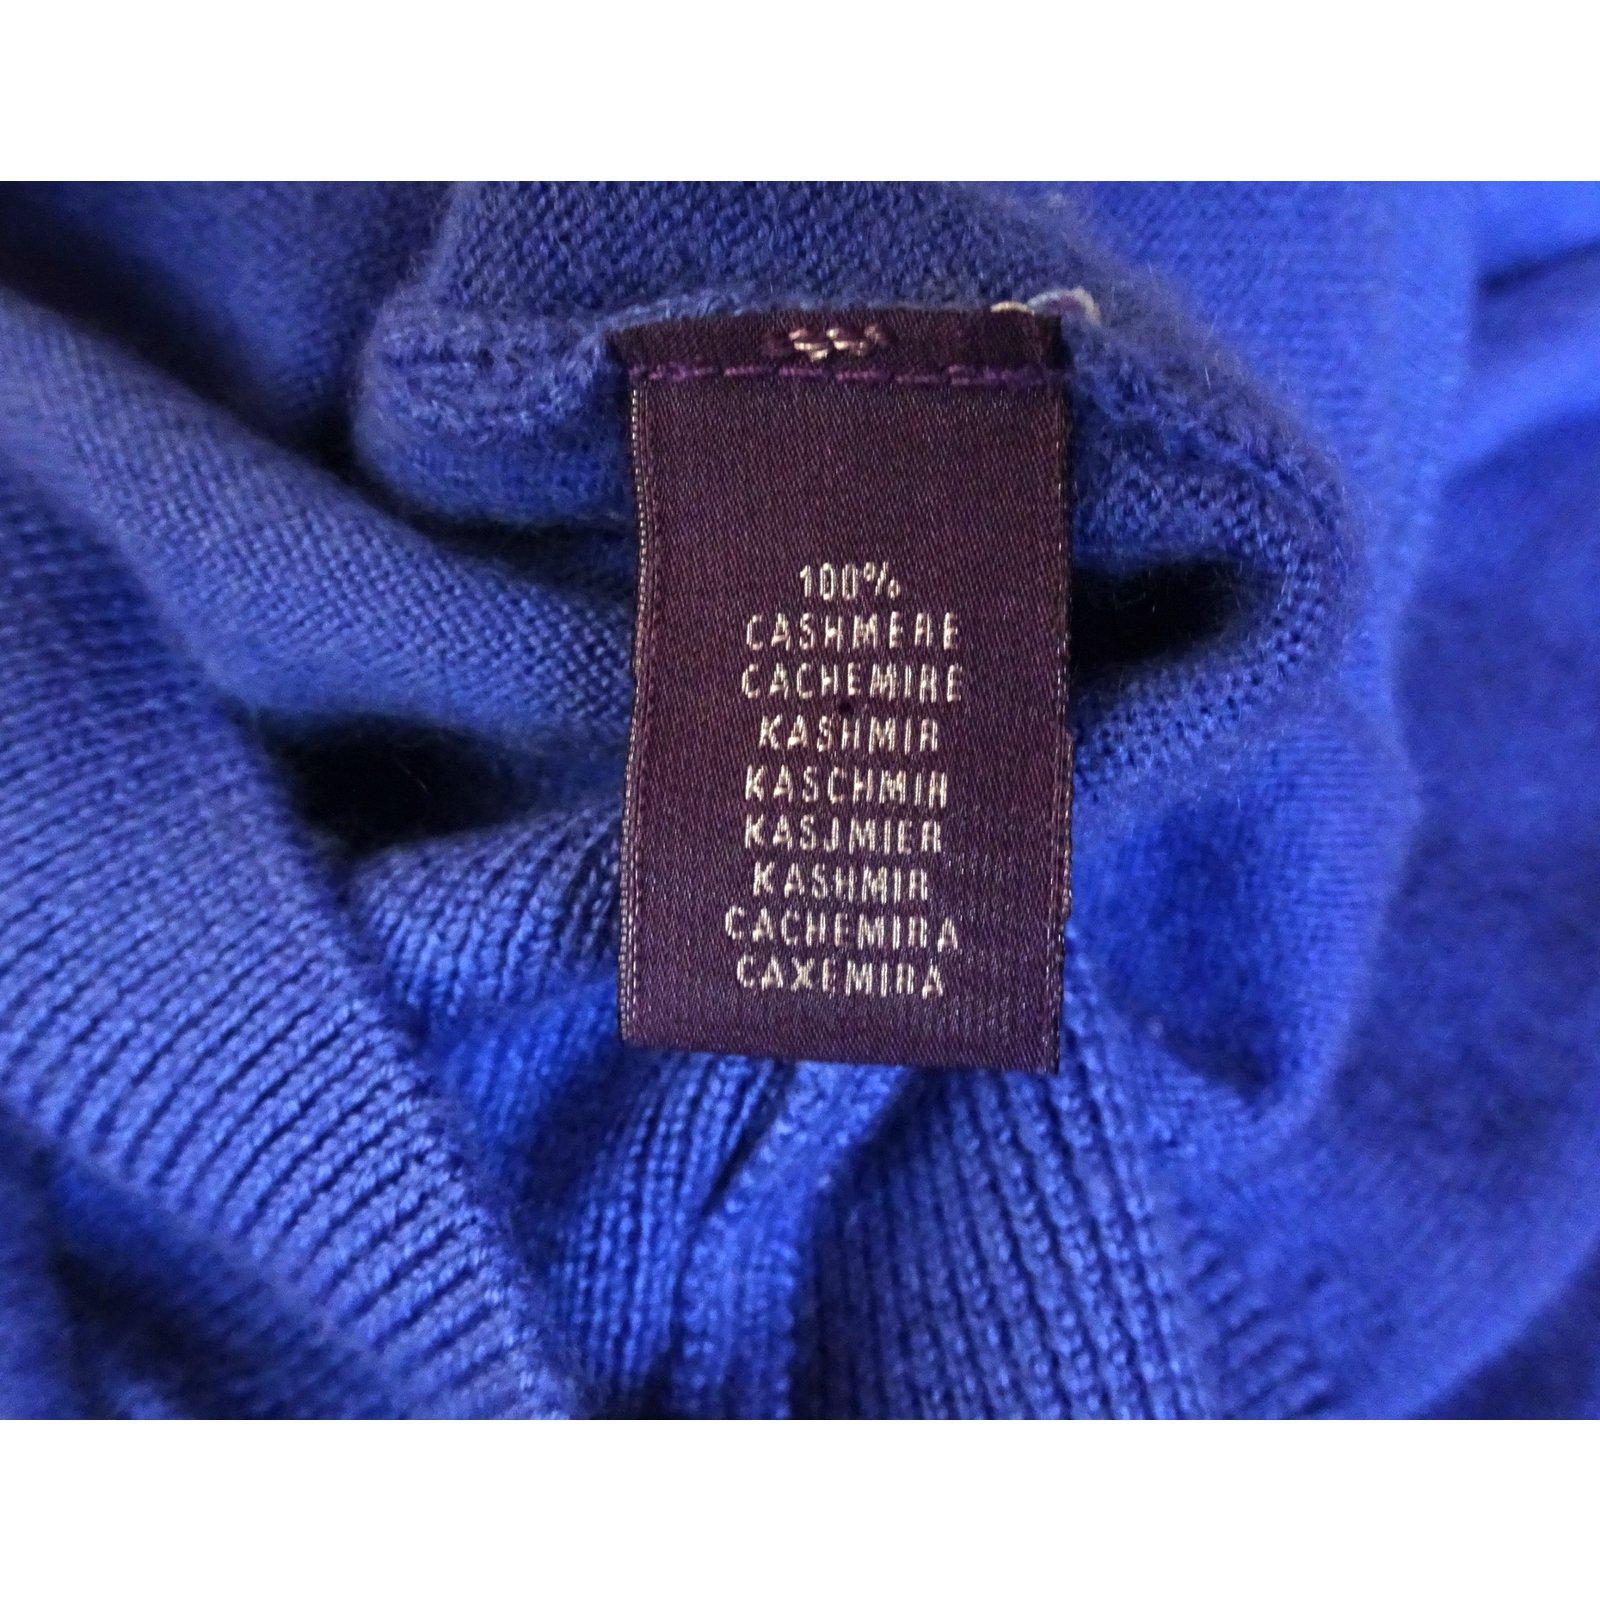 3b92822ac Polo Ralph Lauren RALPH LAUREN PURPLE LABEL TURTLENECK SWEATER Sweaters  Cashmere Blue ref.98195 - Joli Closet